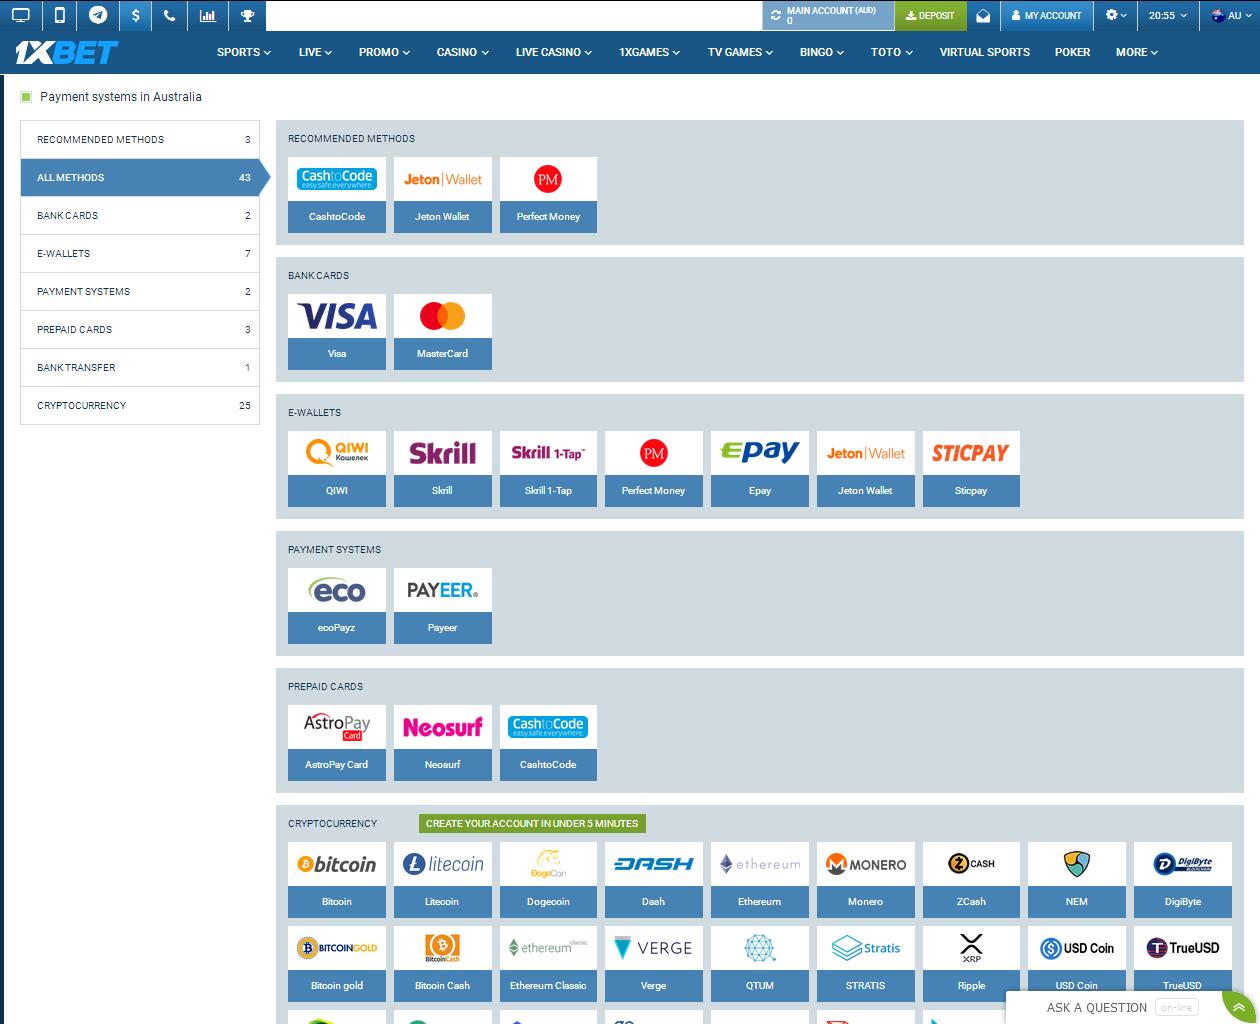 Payment Methods for Australia